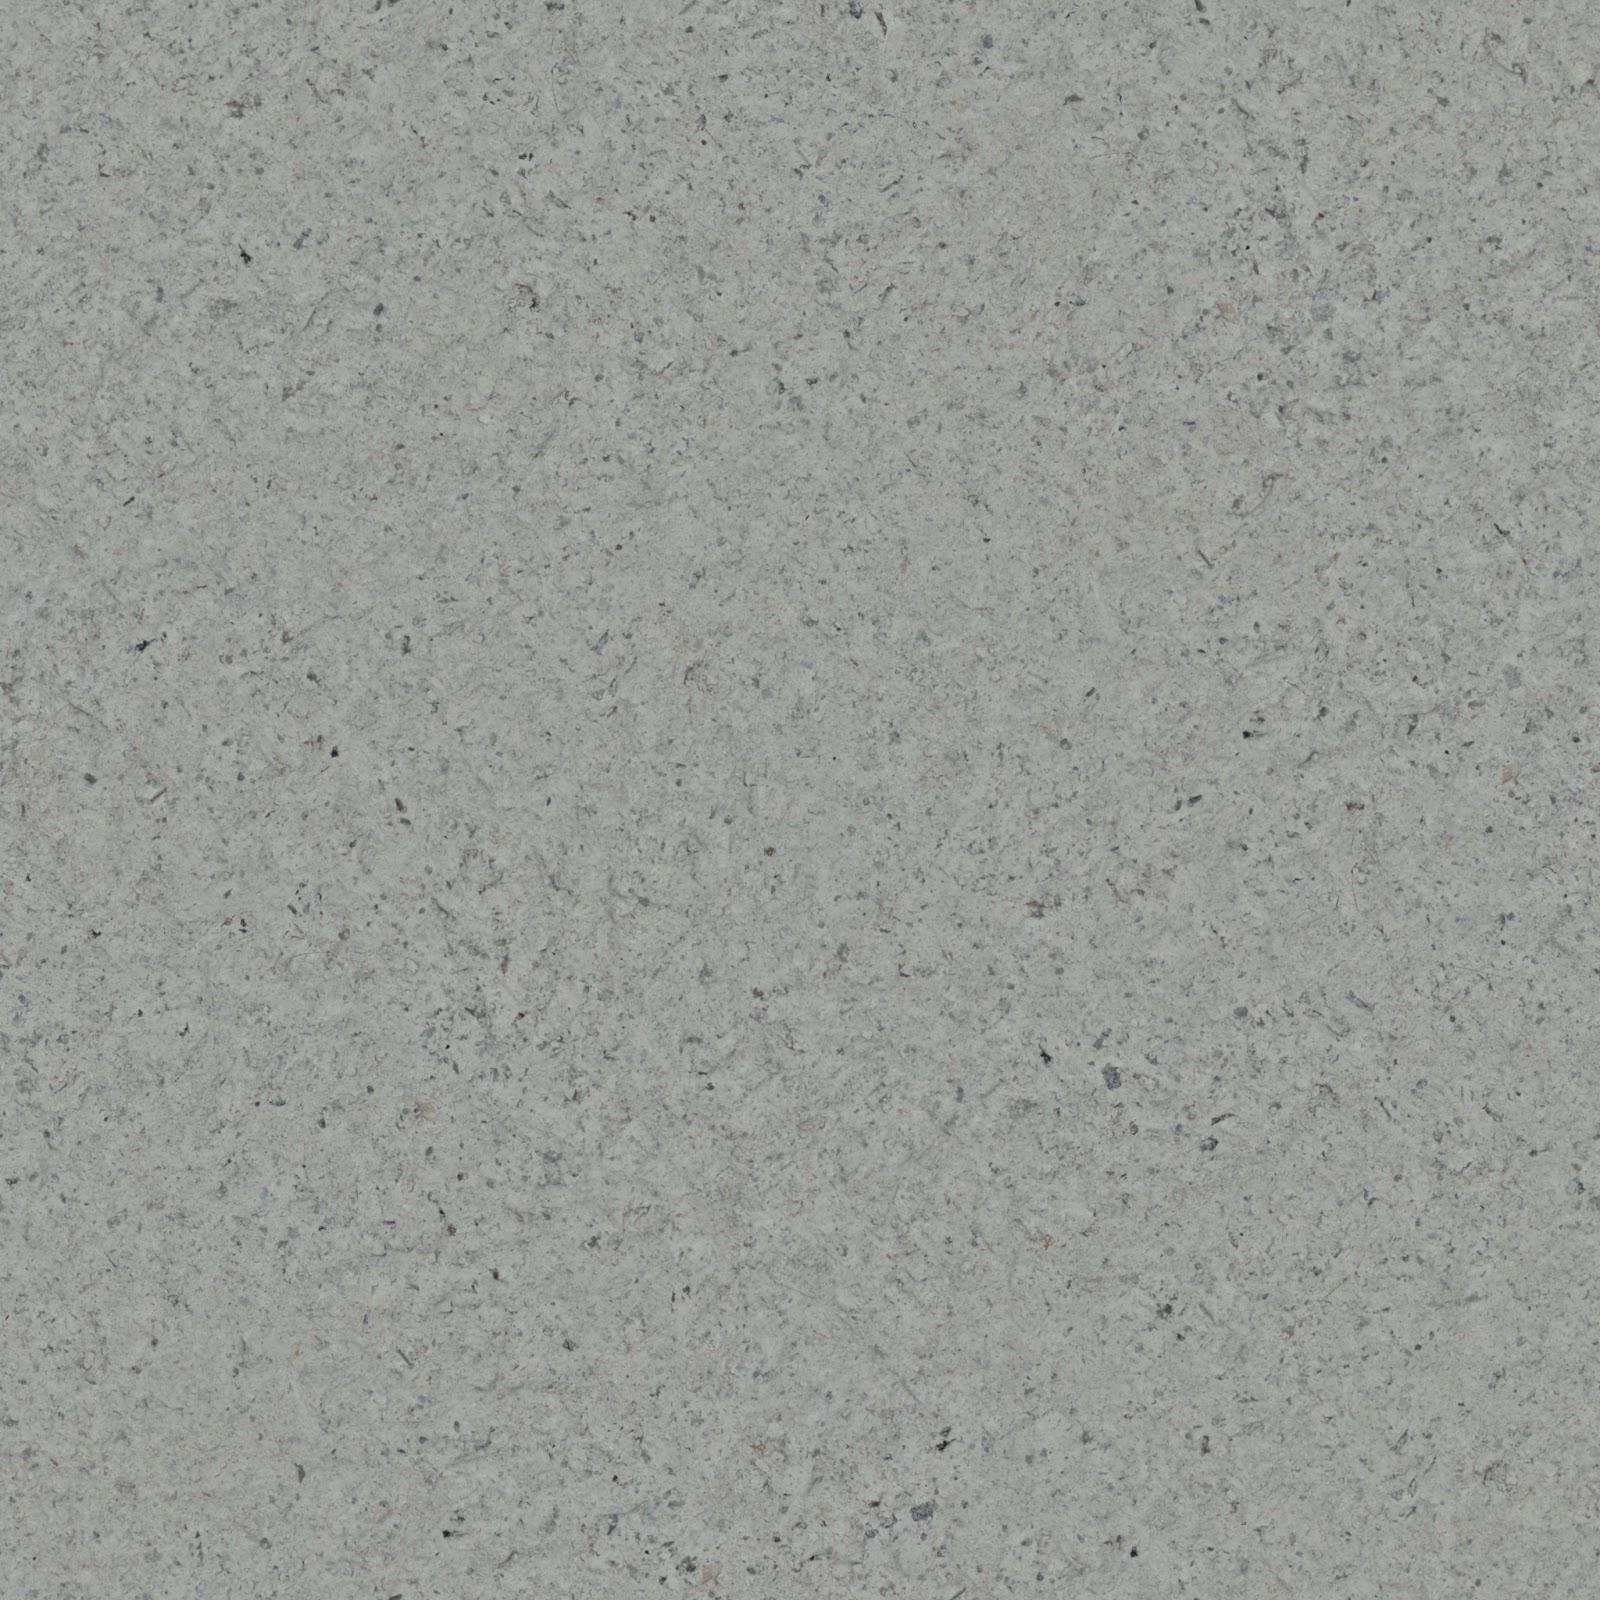 High Resolution Seamless Textures Ground Dusty Grey